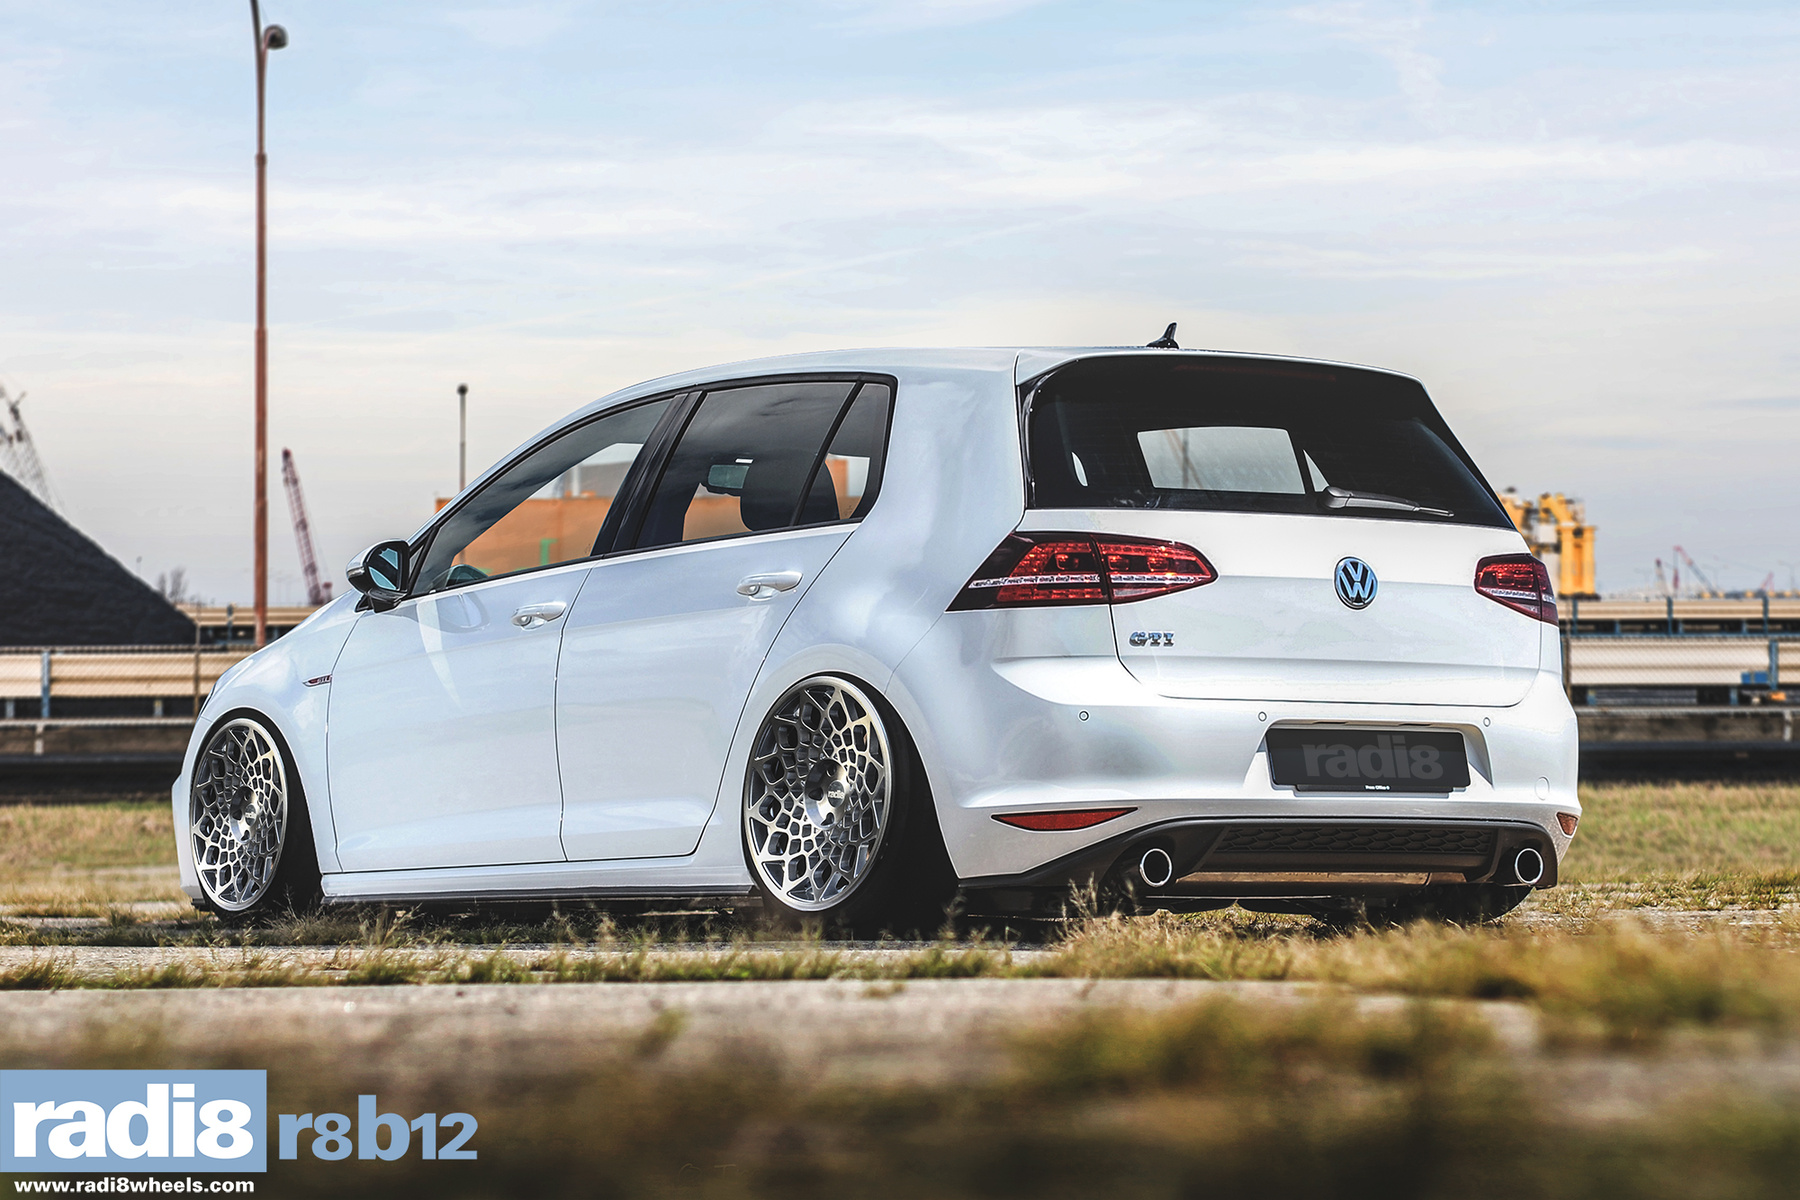 Volkswagen On Radi8 Wheels